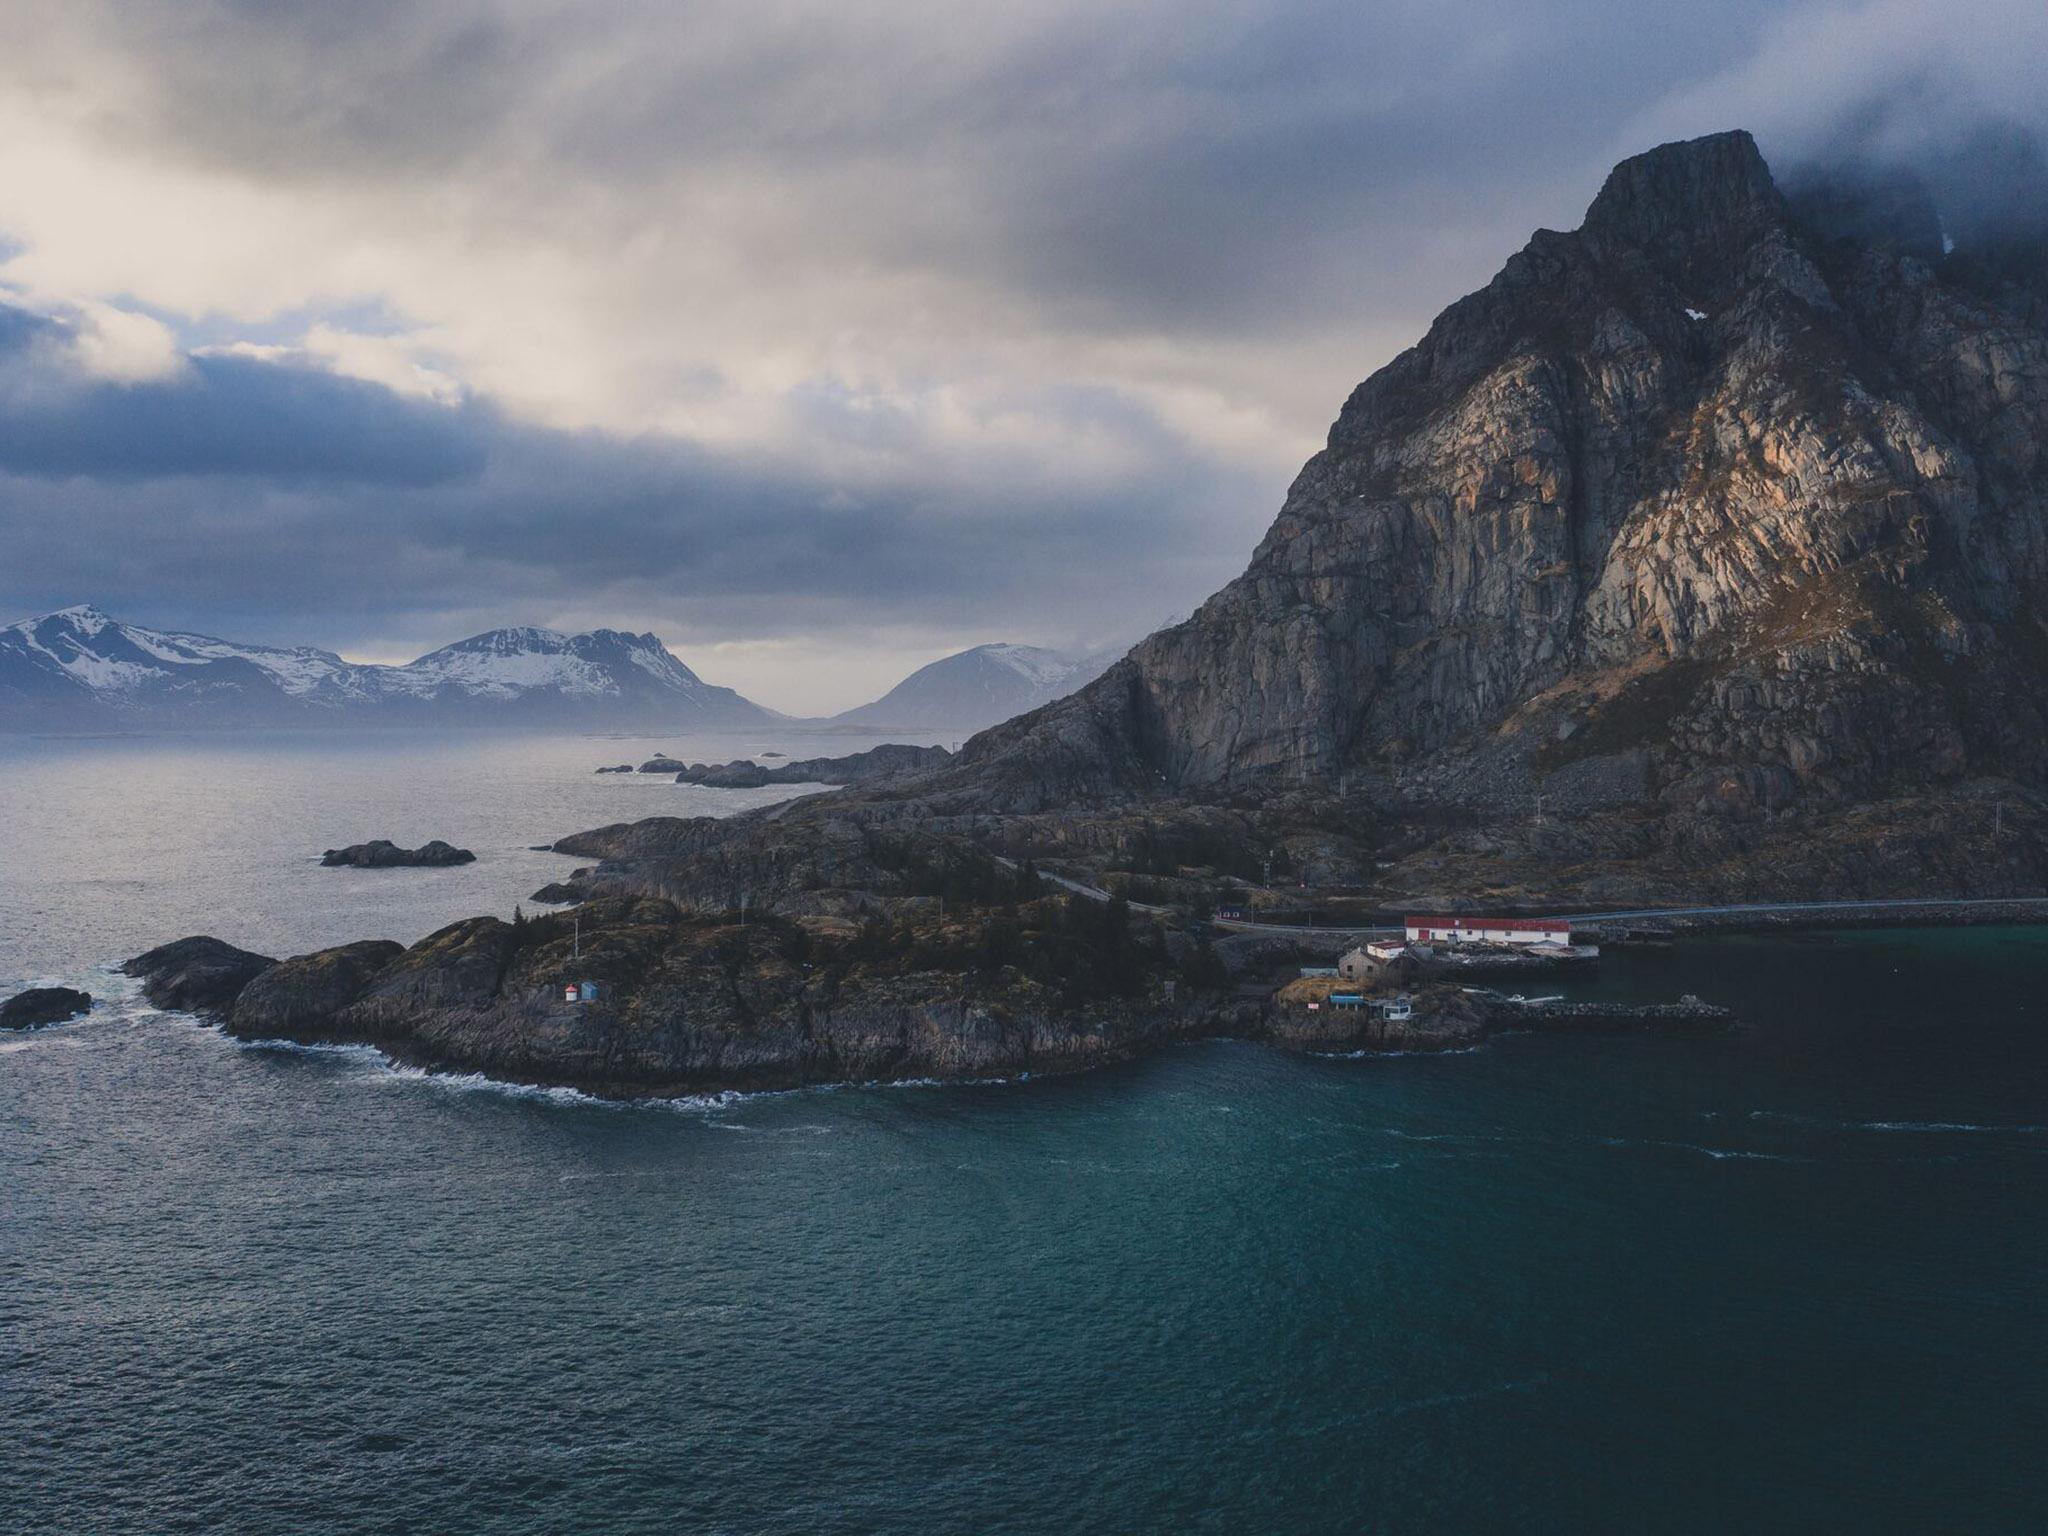 Die Berge Norwegens laden zu tollen Wanderrouten ein. Foto: Hupp Photography.